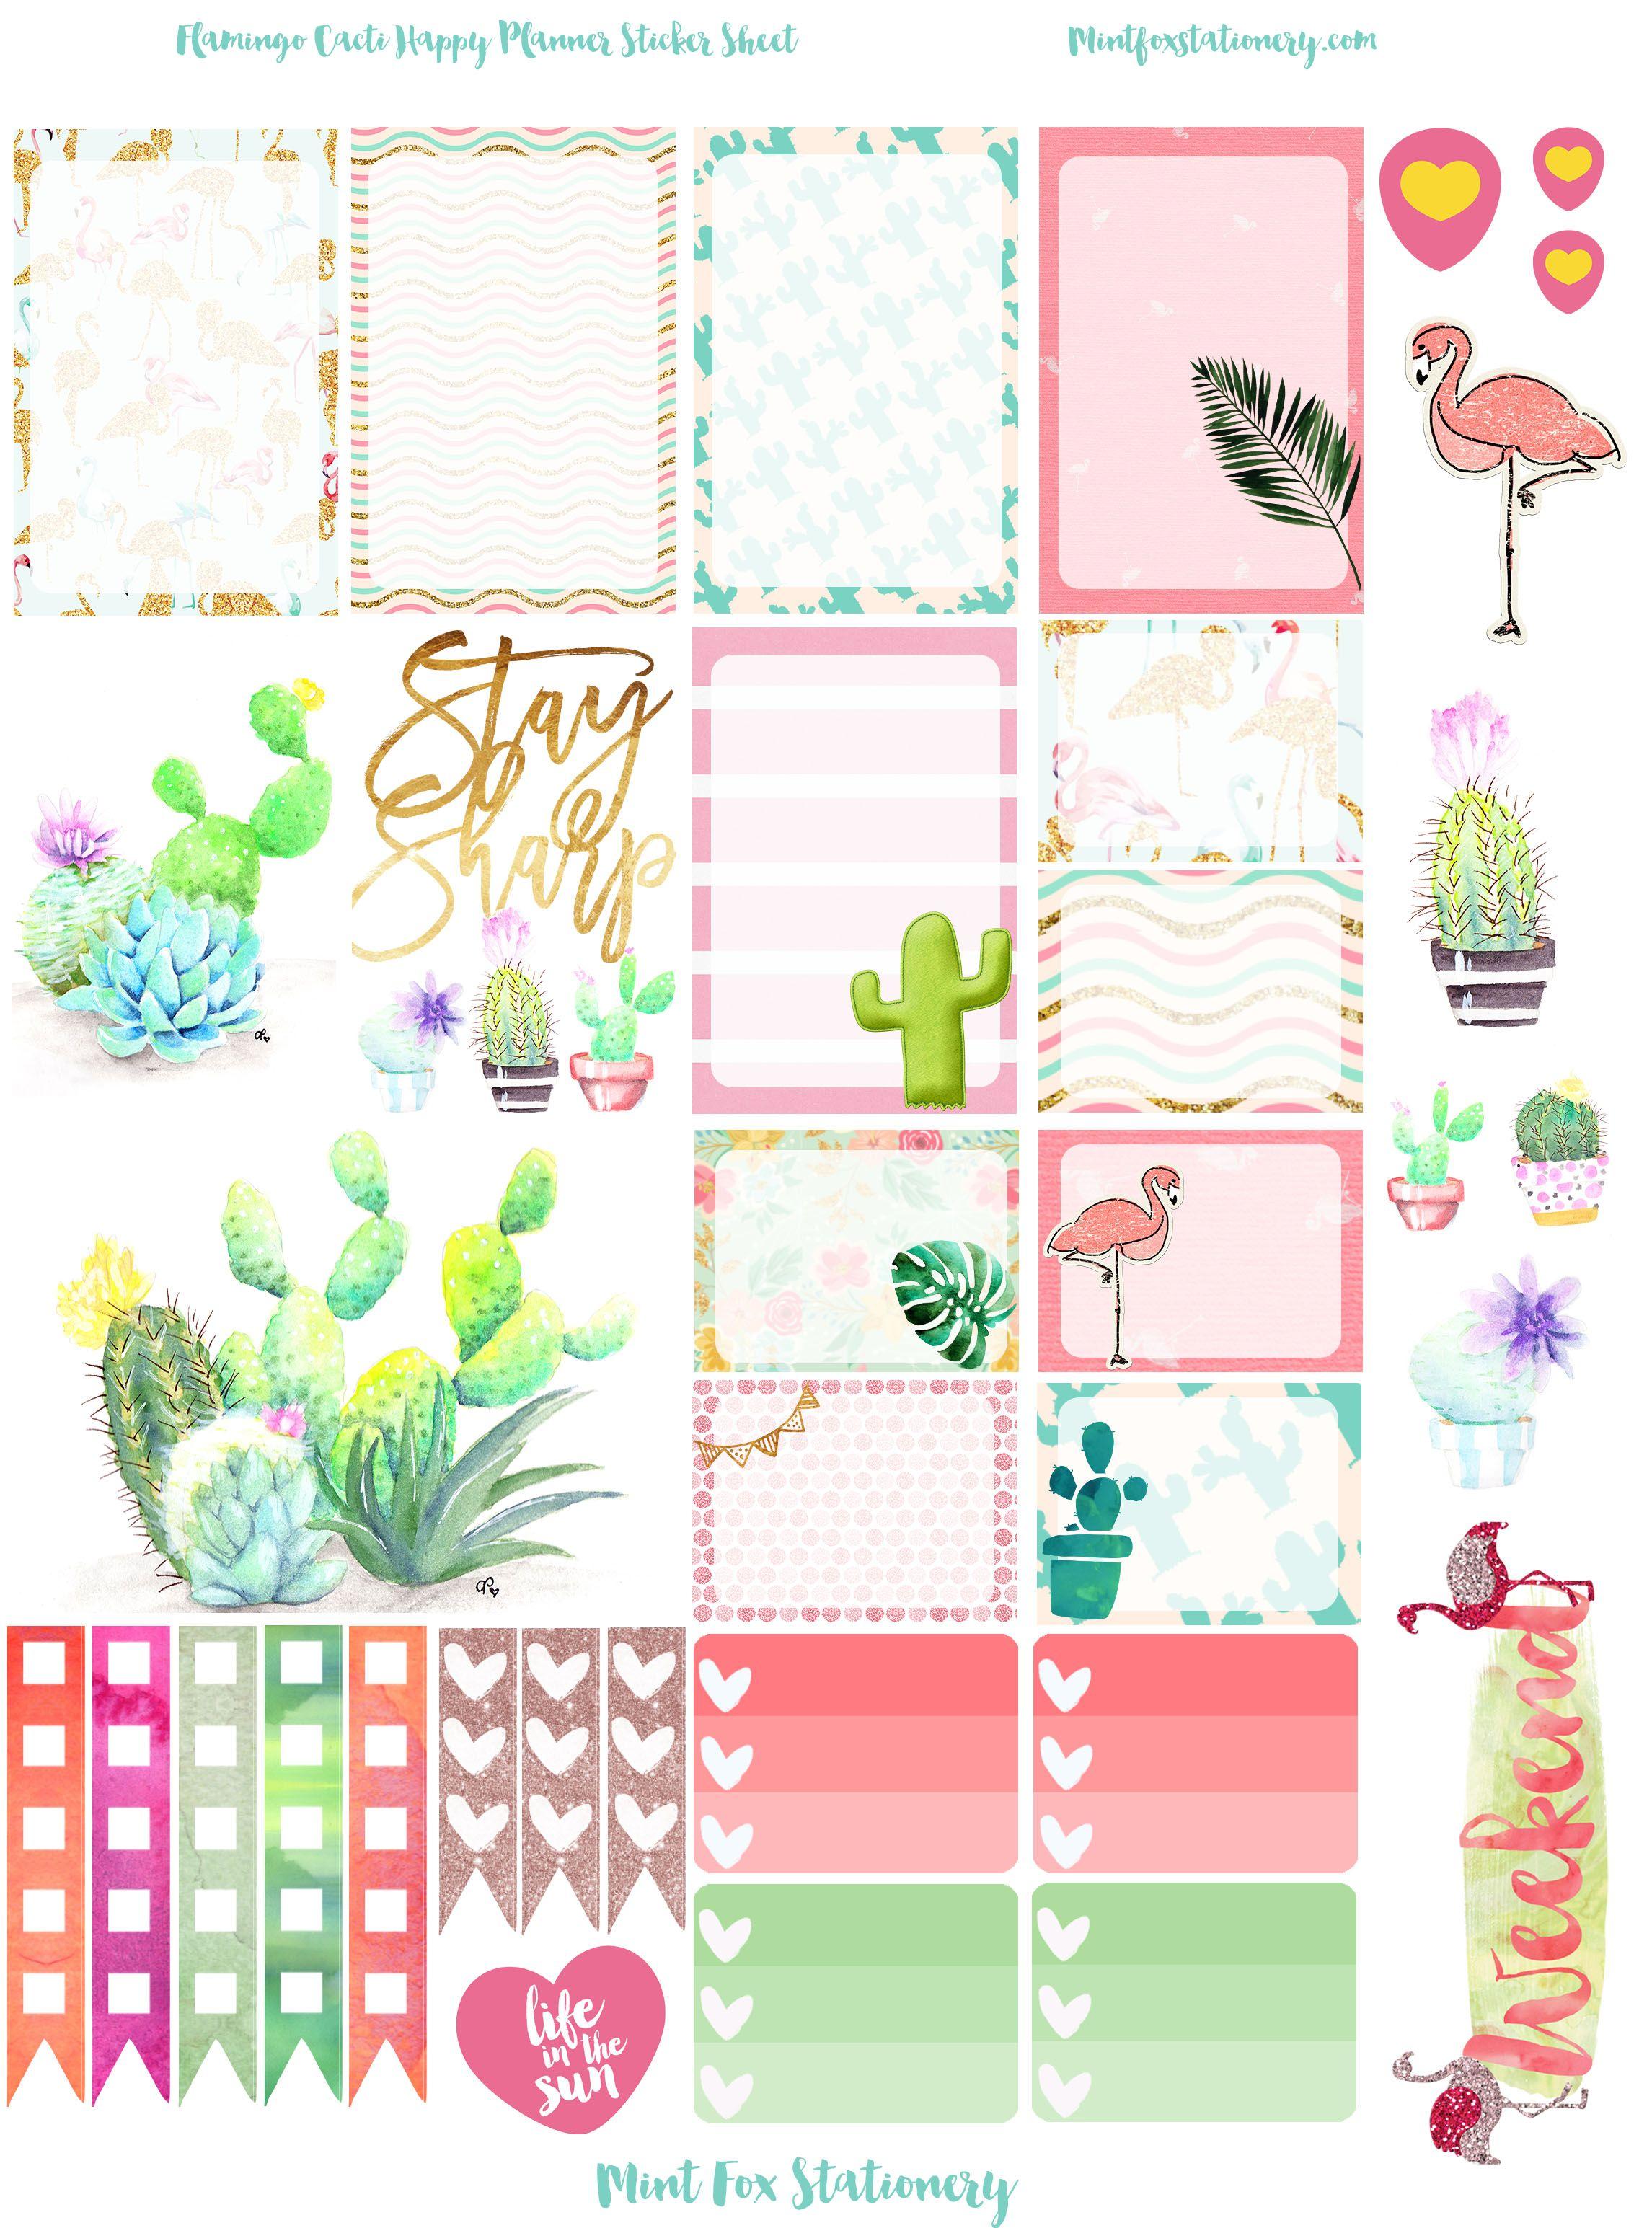 Flamingo Cacti Happy Planner Sticker Sheet At Mint Fox Stationary